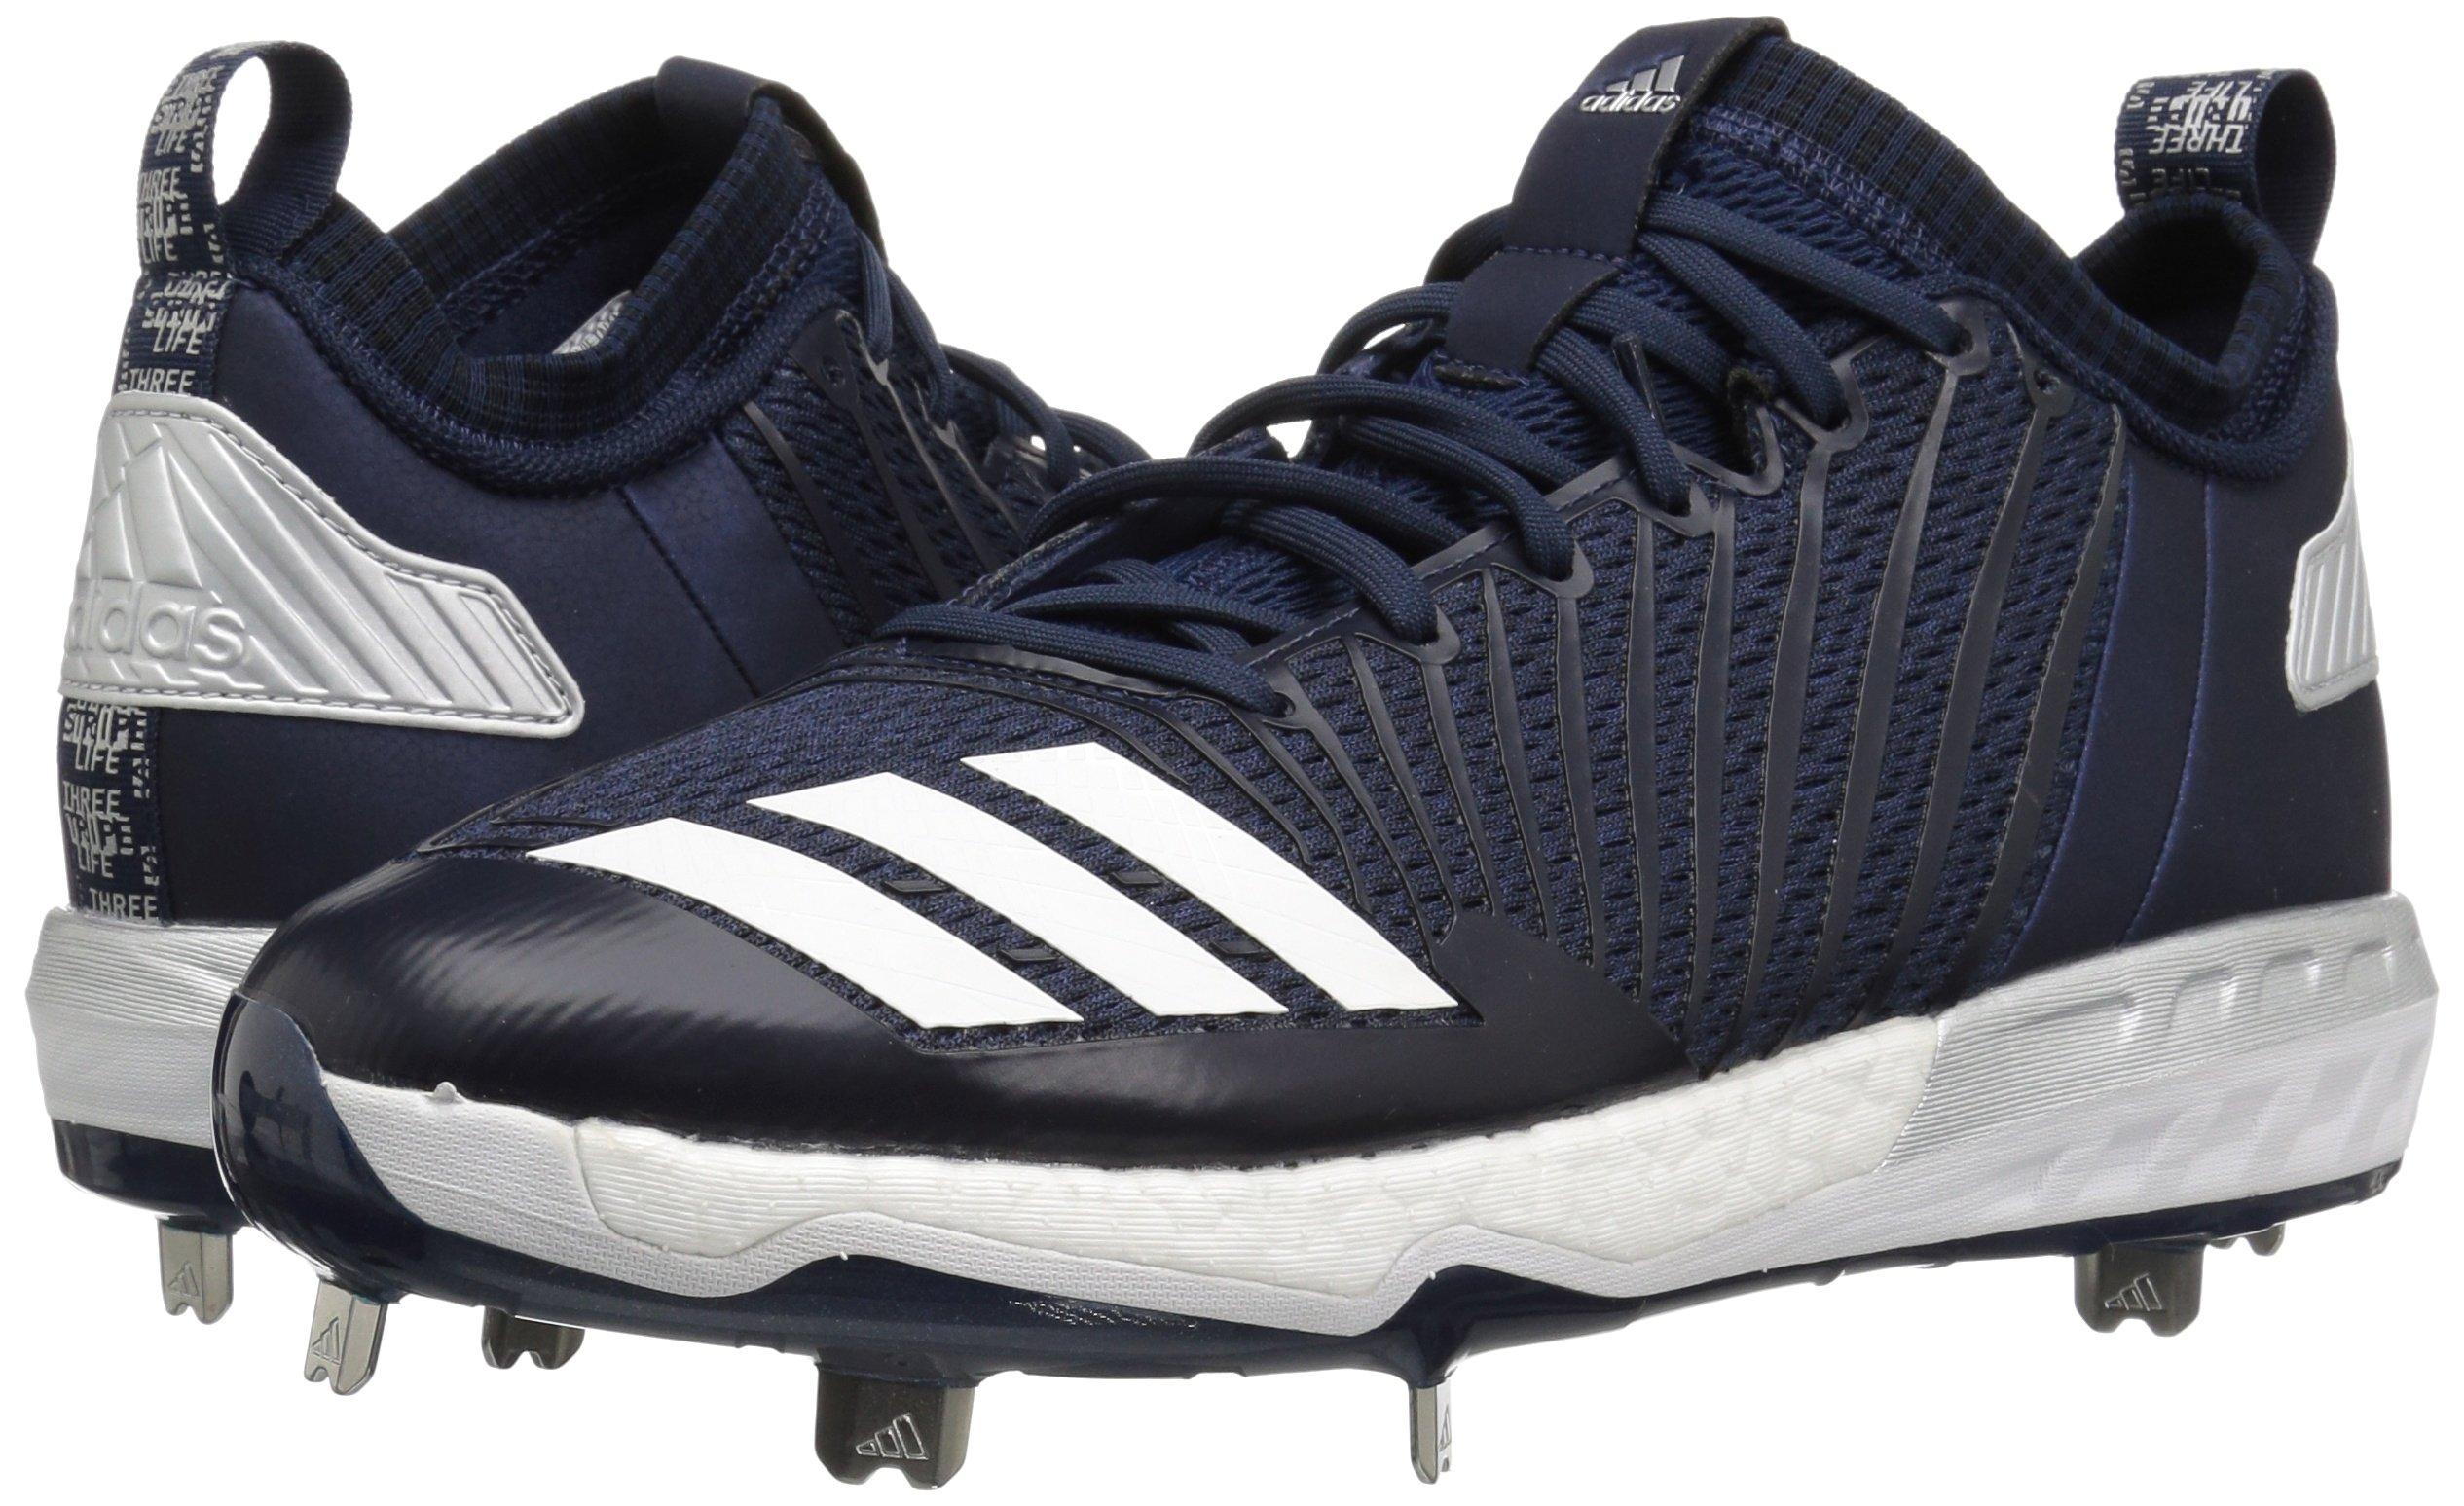 adidas Men's Freak X Carbon Mid Baseball Shoe, Collegiate Navy/White/Metallic Silver, 8 Medium US by adidas (Image #6)